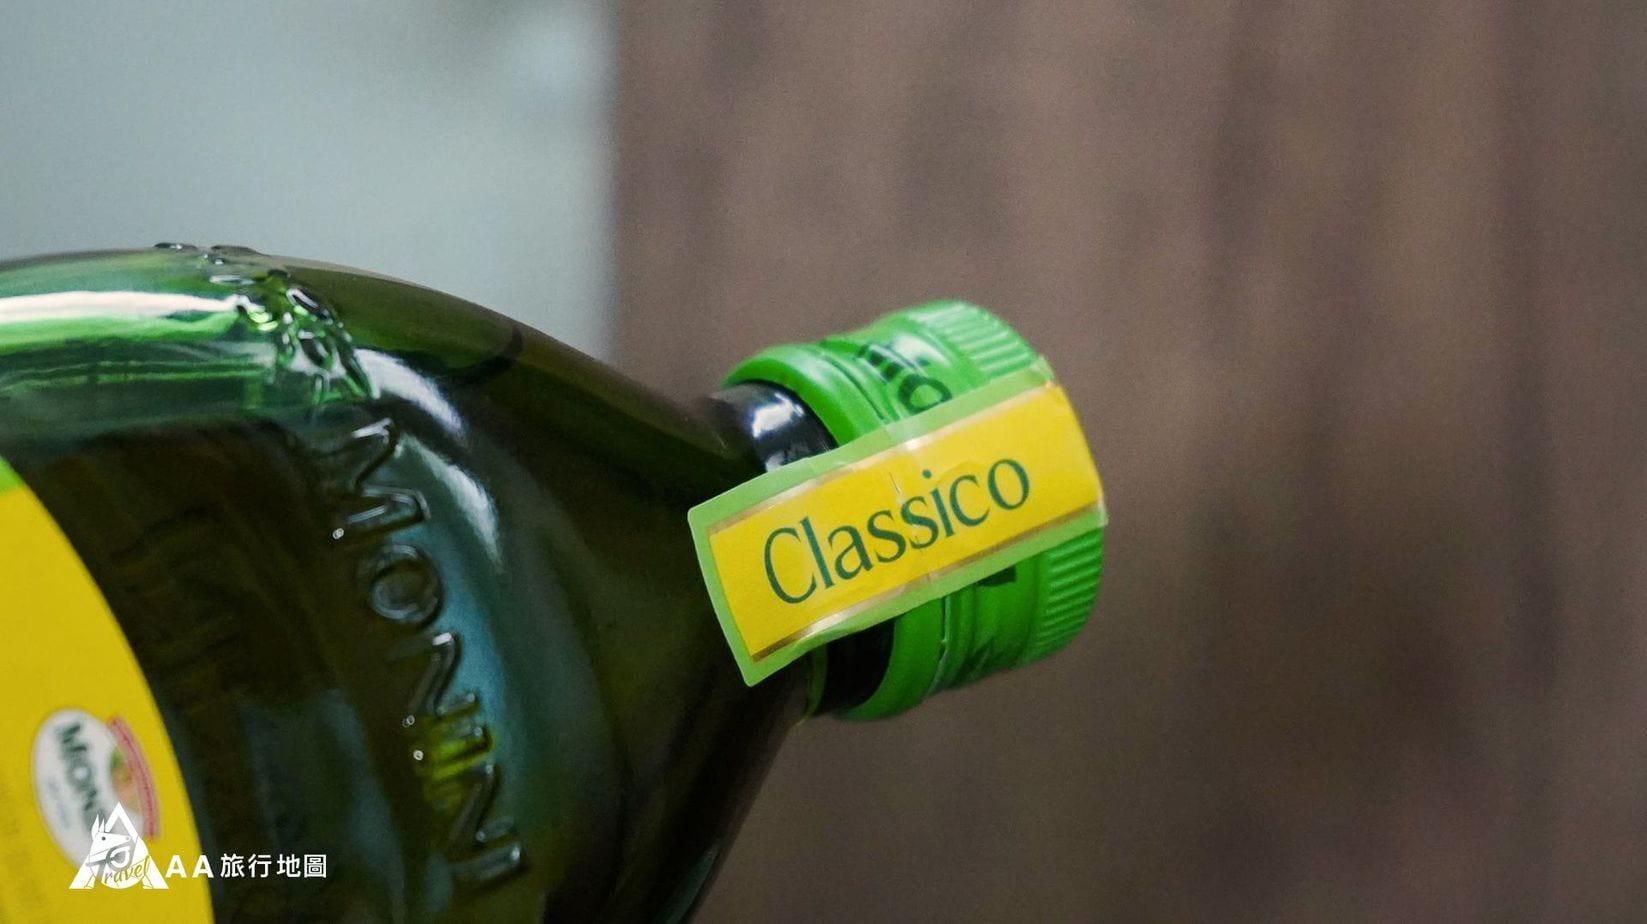 monini-瓶口的設計很清楚可以知道都有品質保證